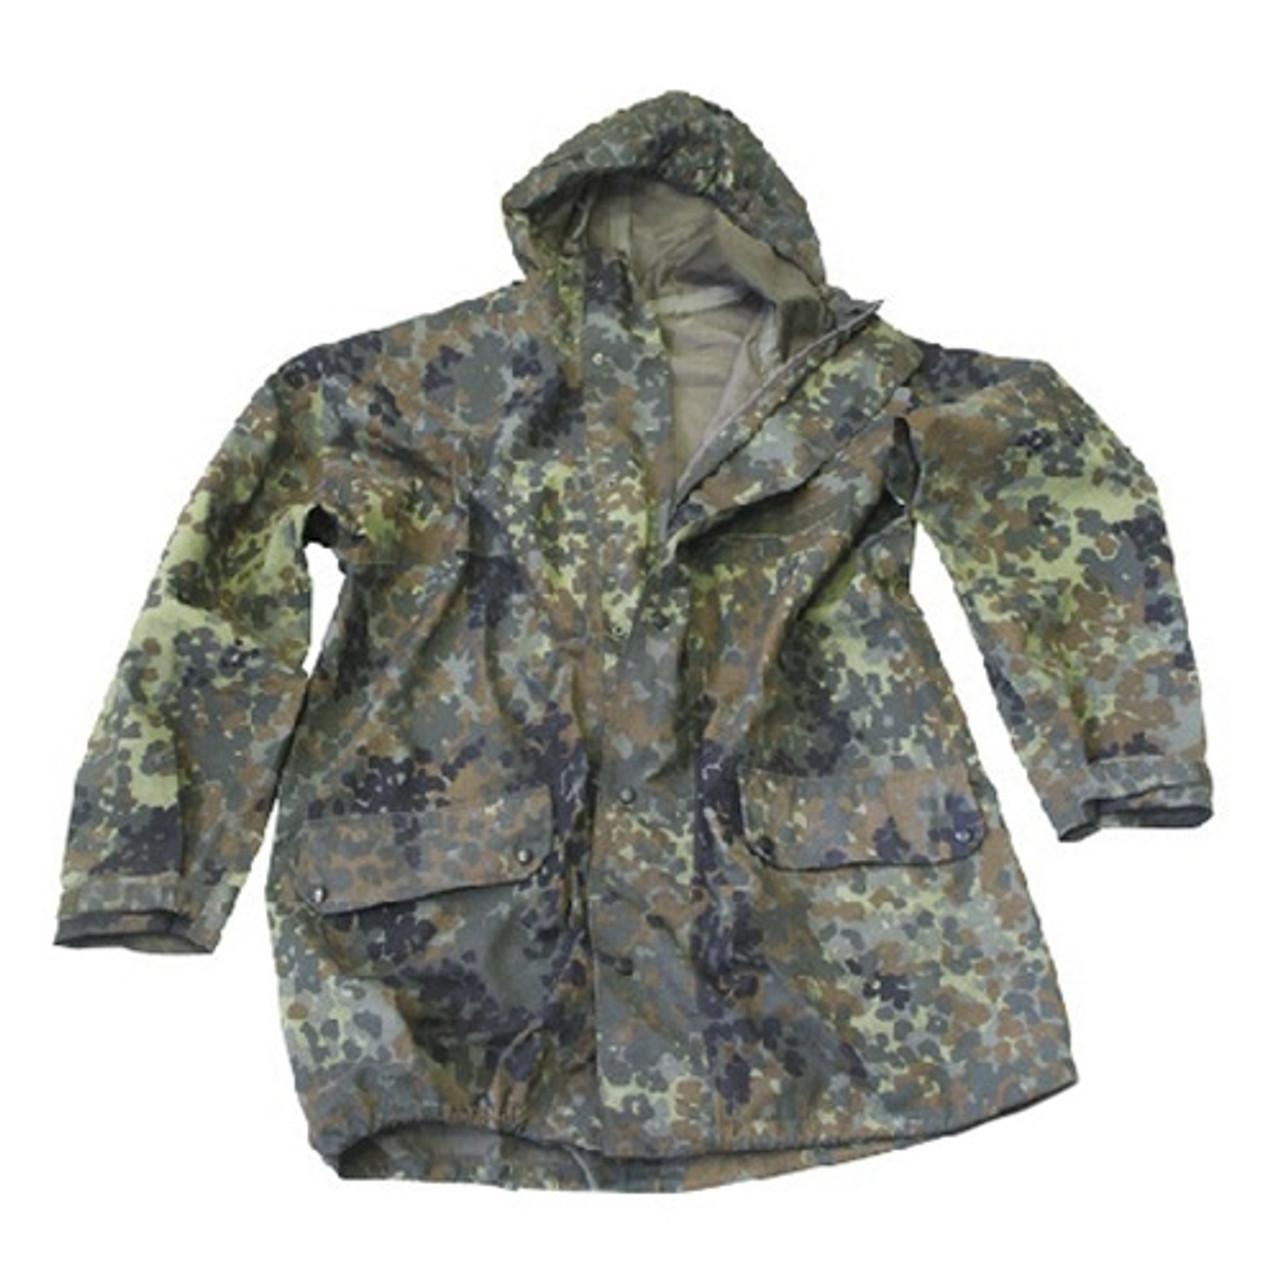 German Flectar Camo Wet Weather Jacket - Used from Hessen Surplus